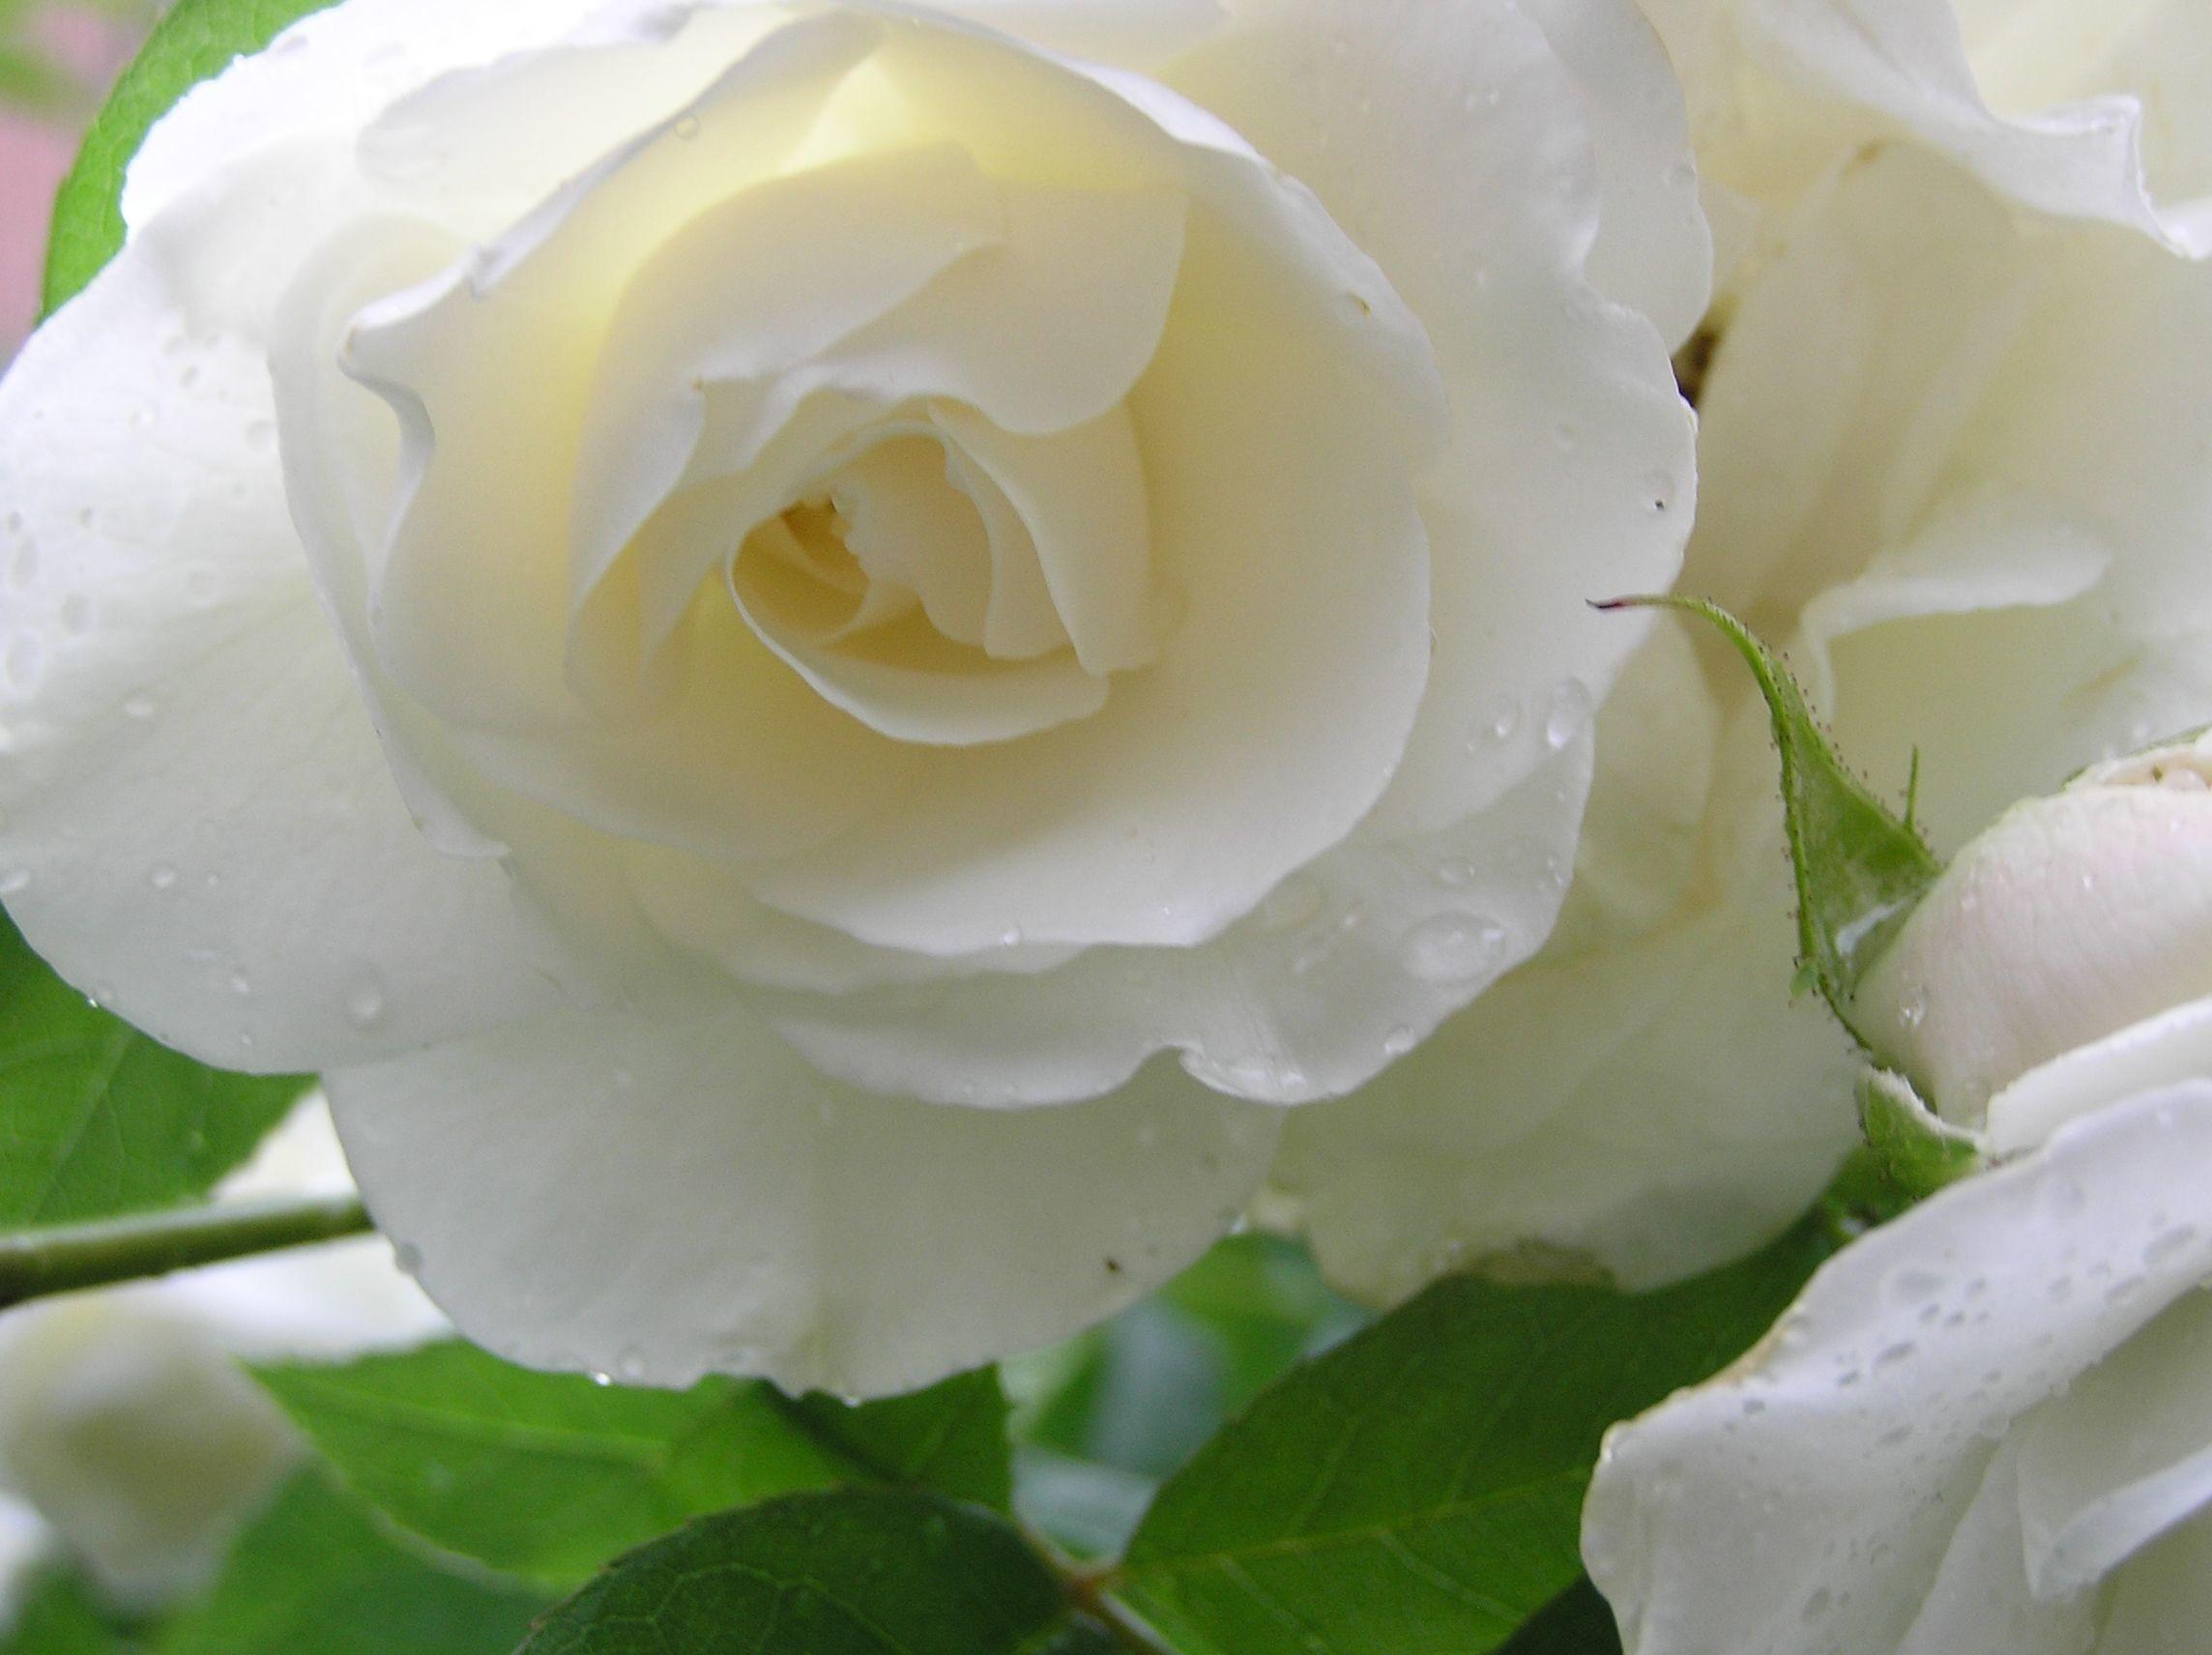 White rose wallpapers 2288x1712 white rose flower wallpaper download white mightylinksfo